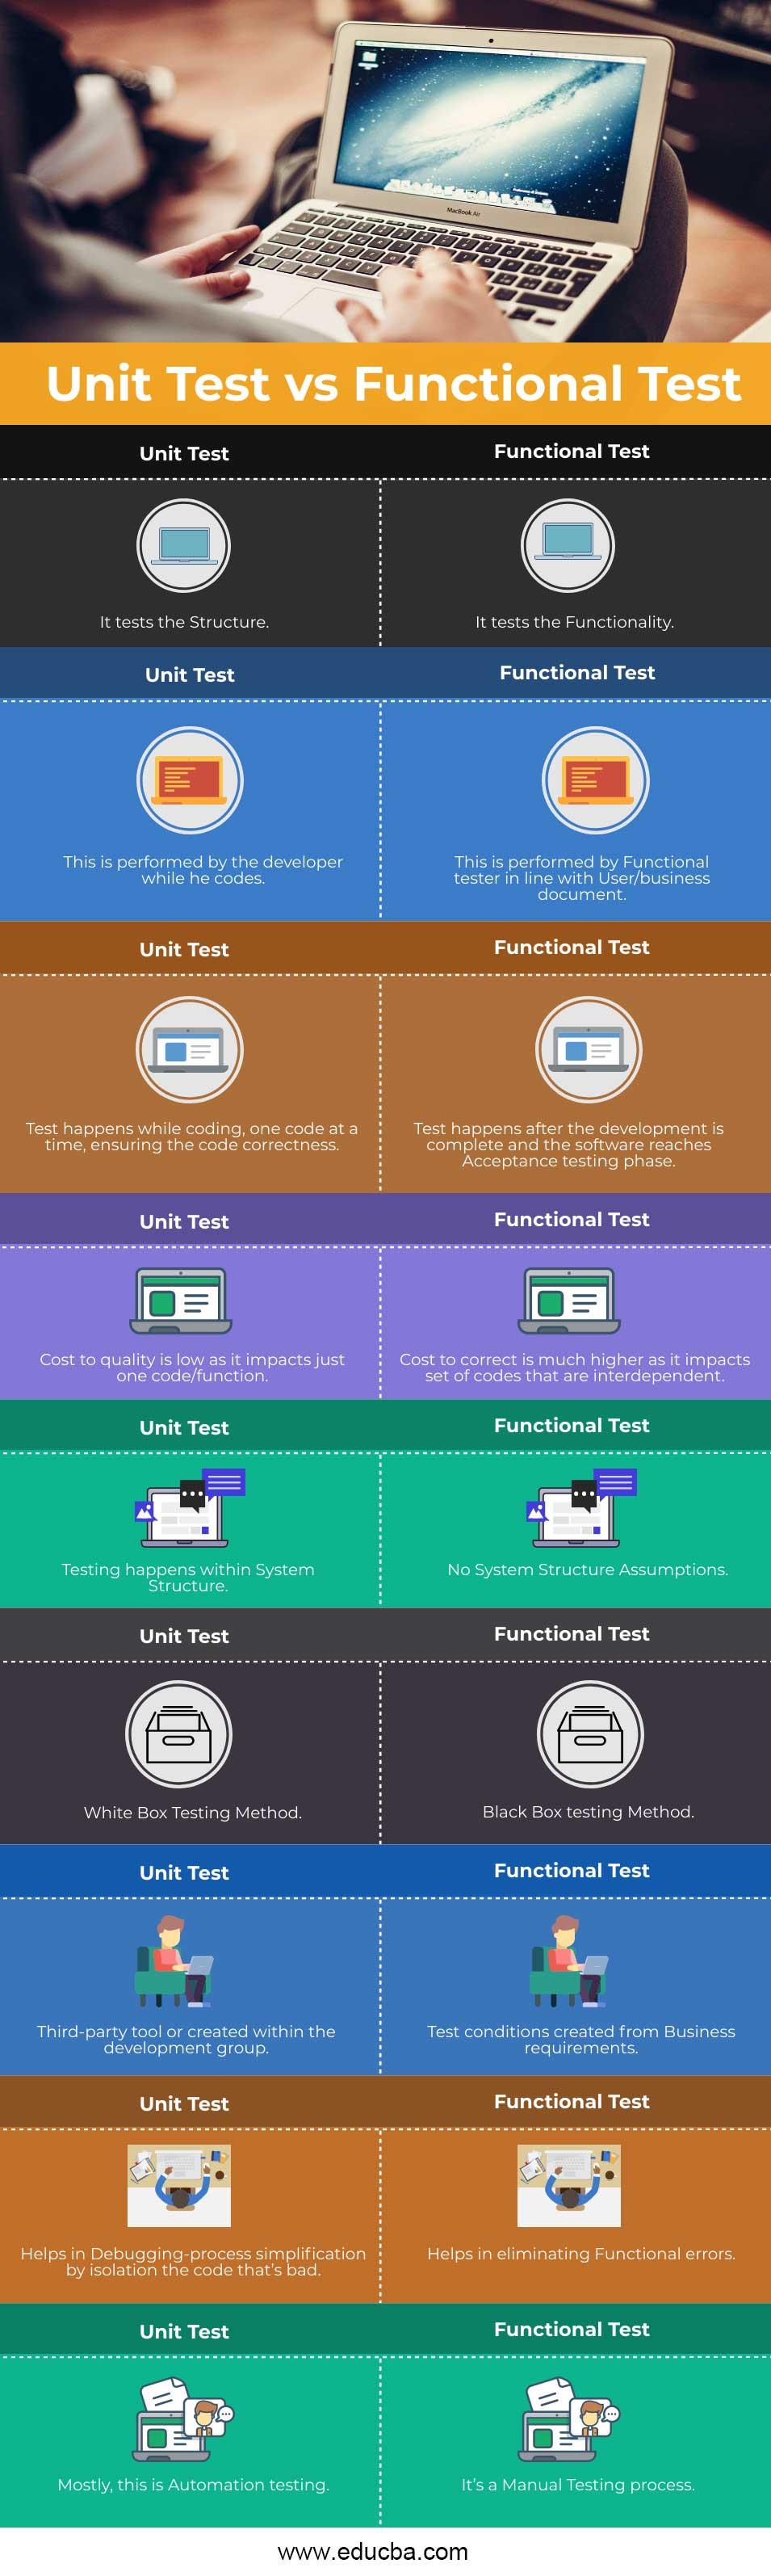 Unit-Test-vs-Functional-Test-info